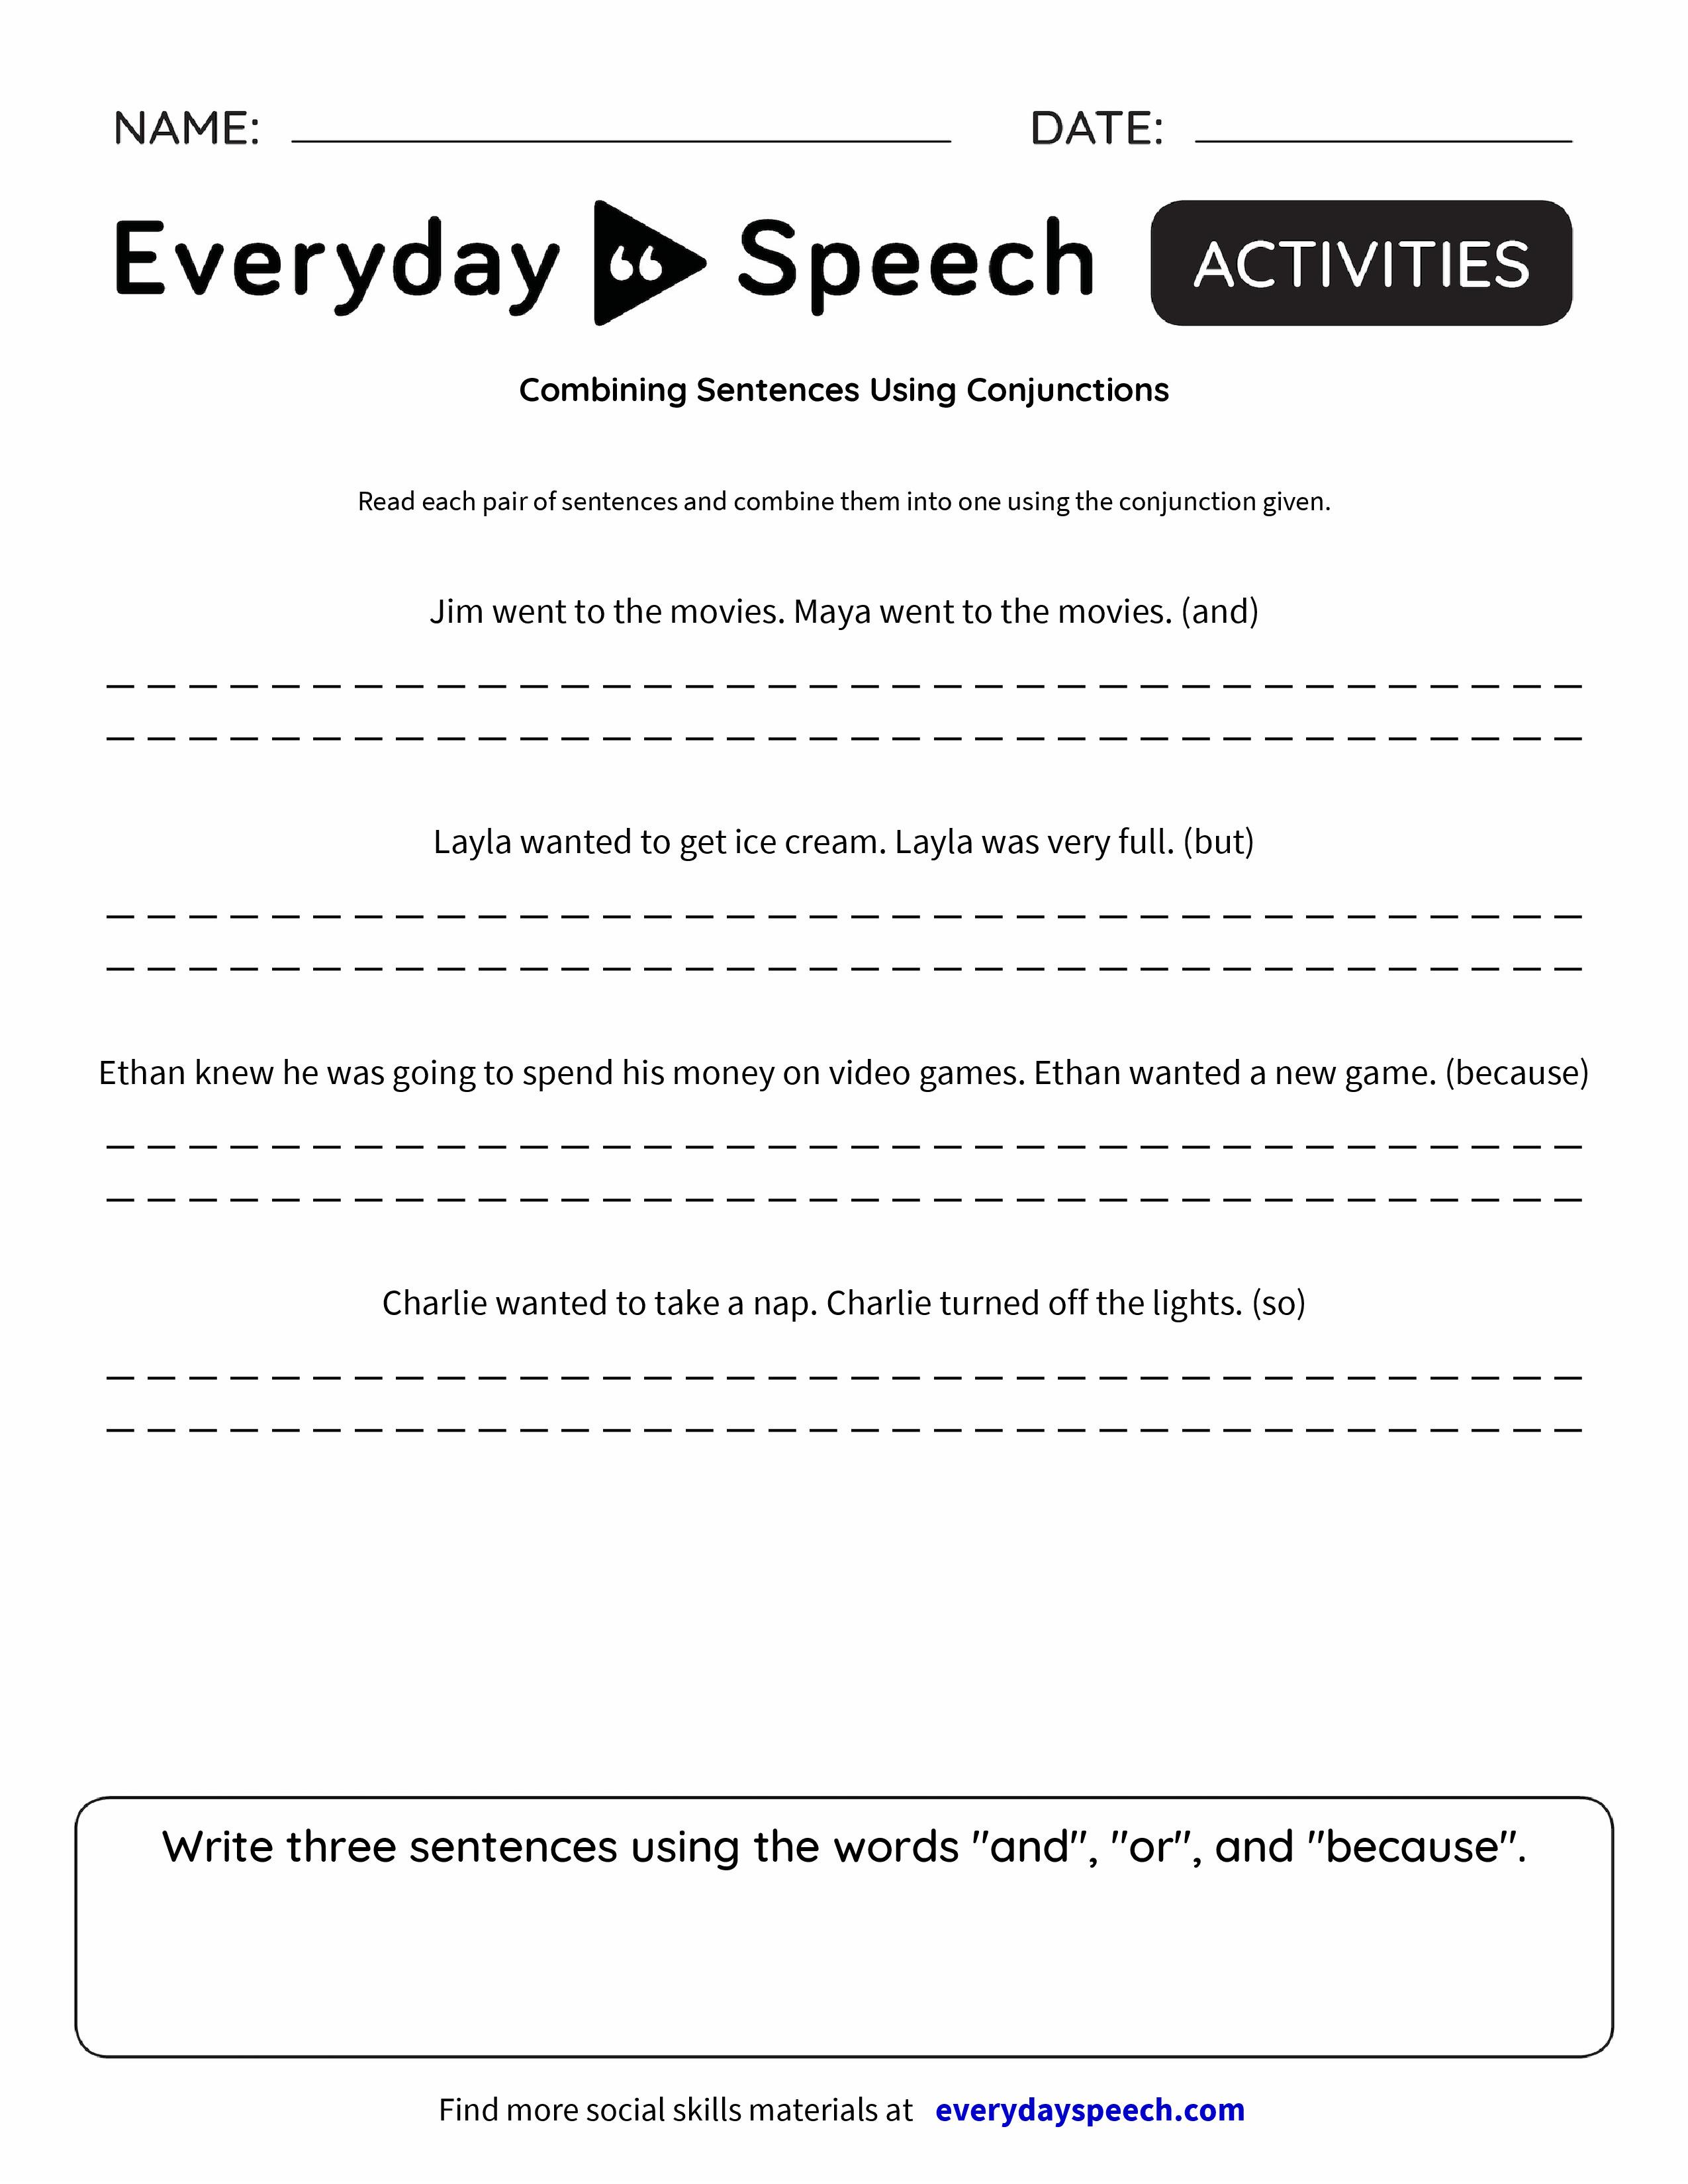 hight resolution of https://dubaikhalifas.com/combine-the-sentences-using-conjunctions-worksheet/